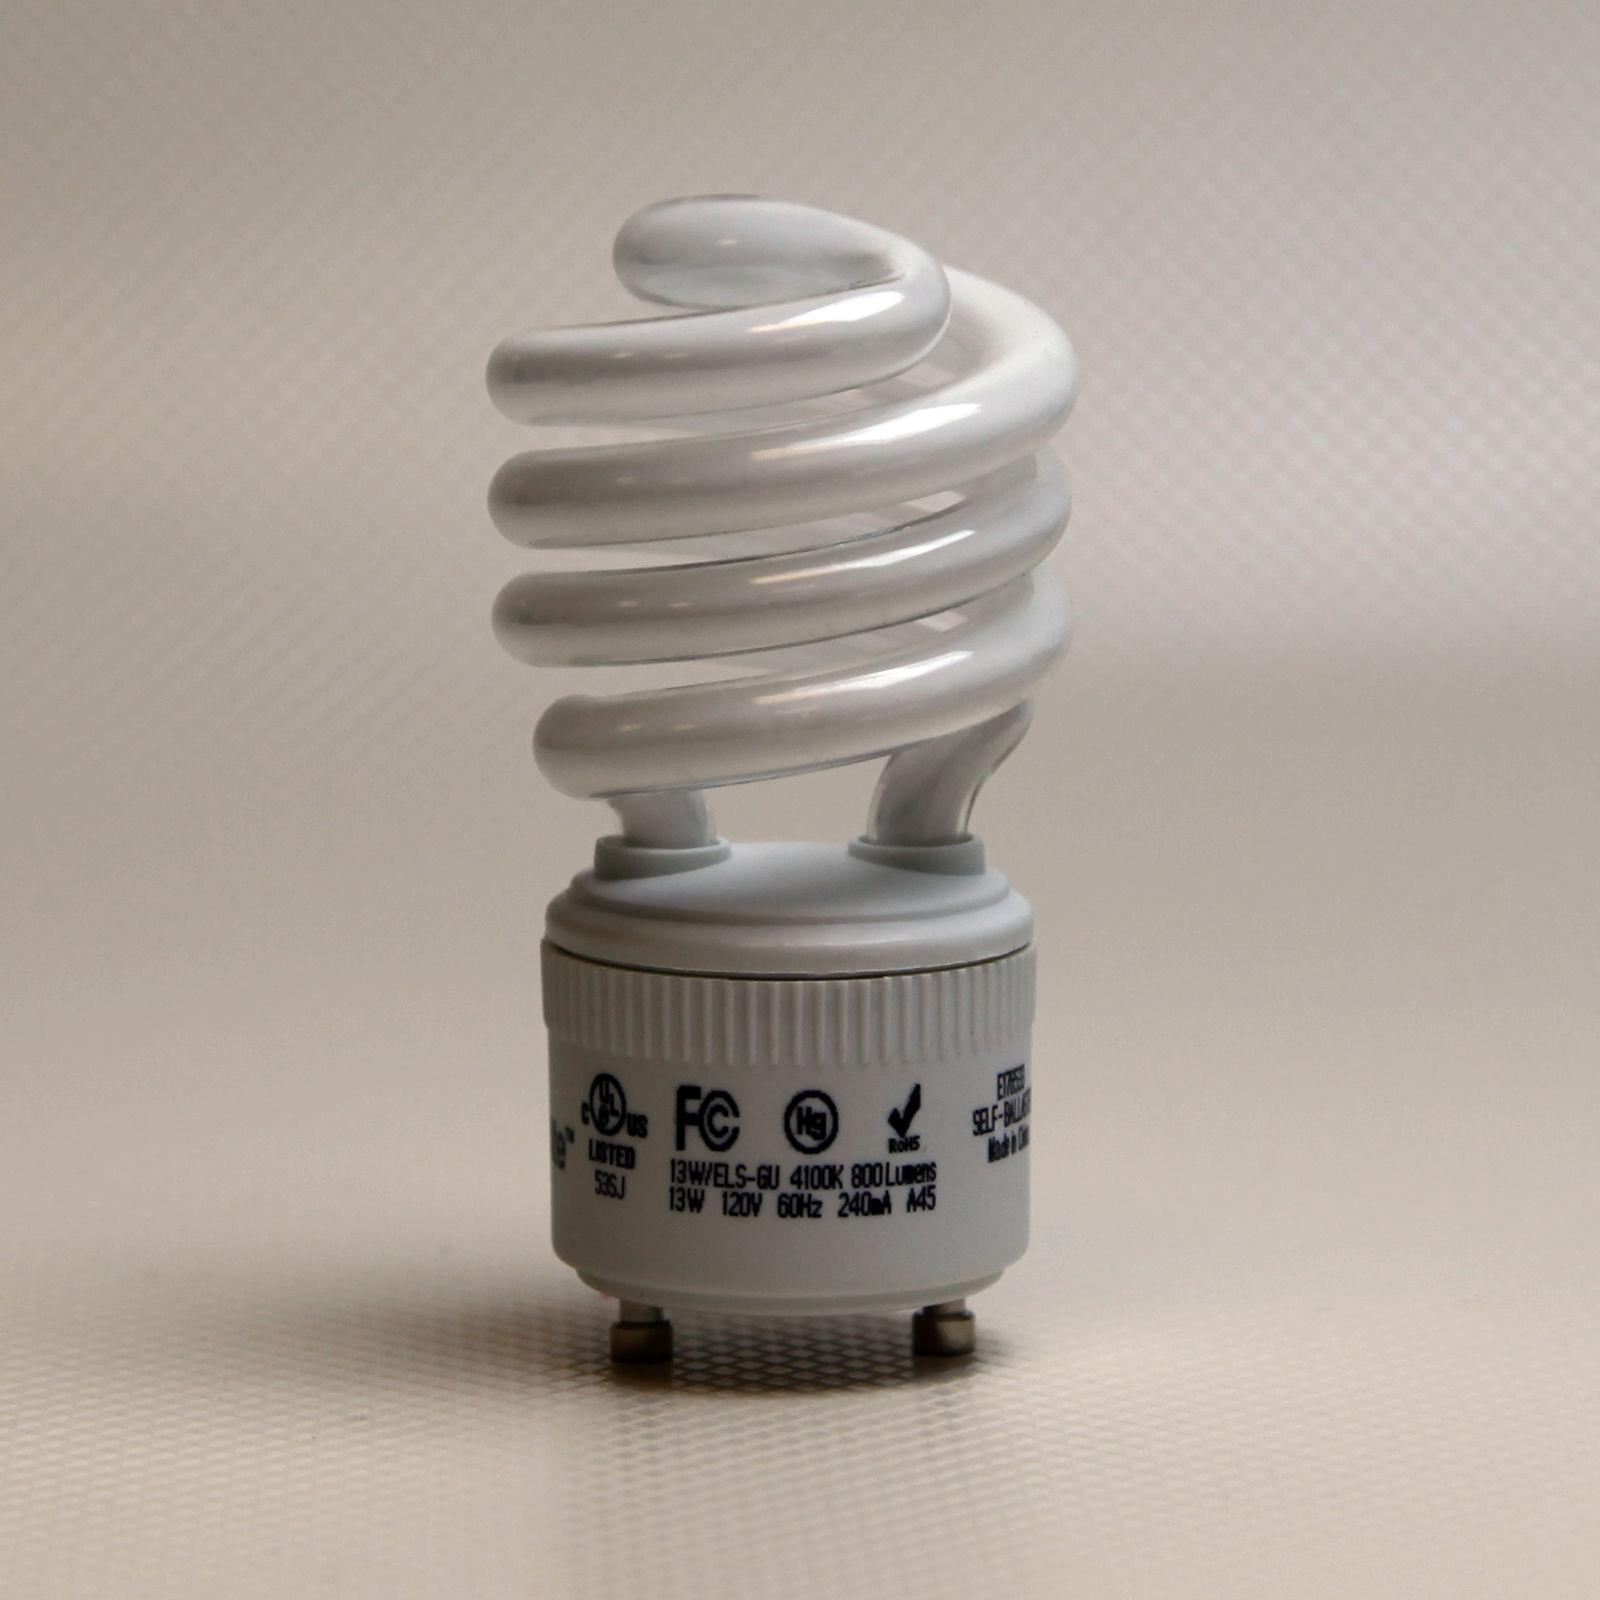 13W Fluorescent Light Bulb High Lumen 2700K Output GU24 Base CFL 60W Warm White